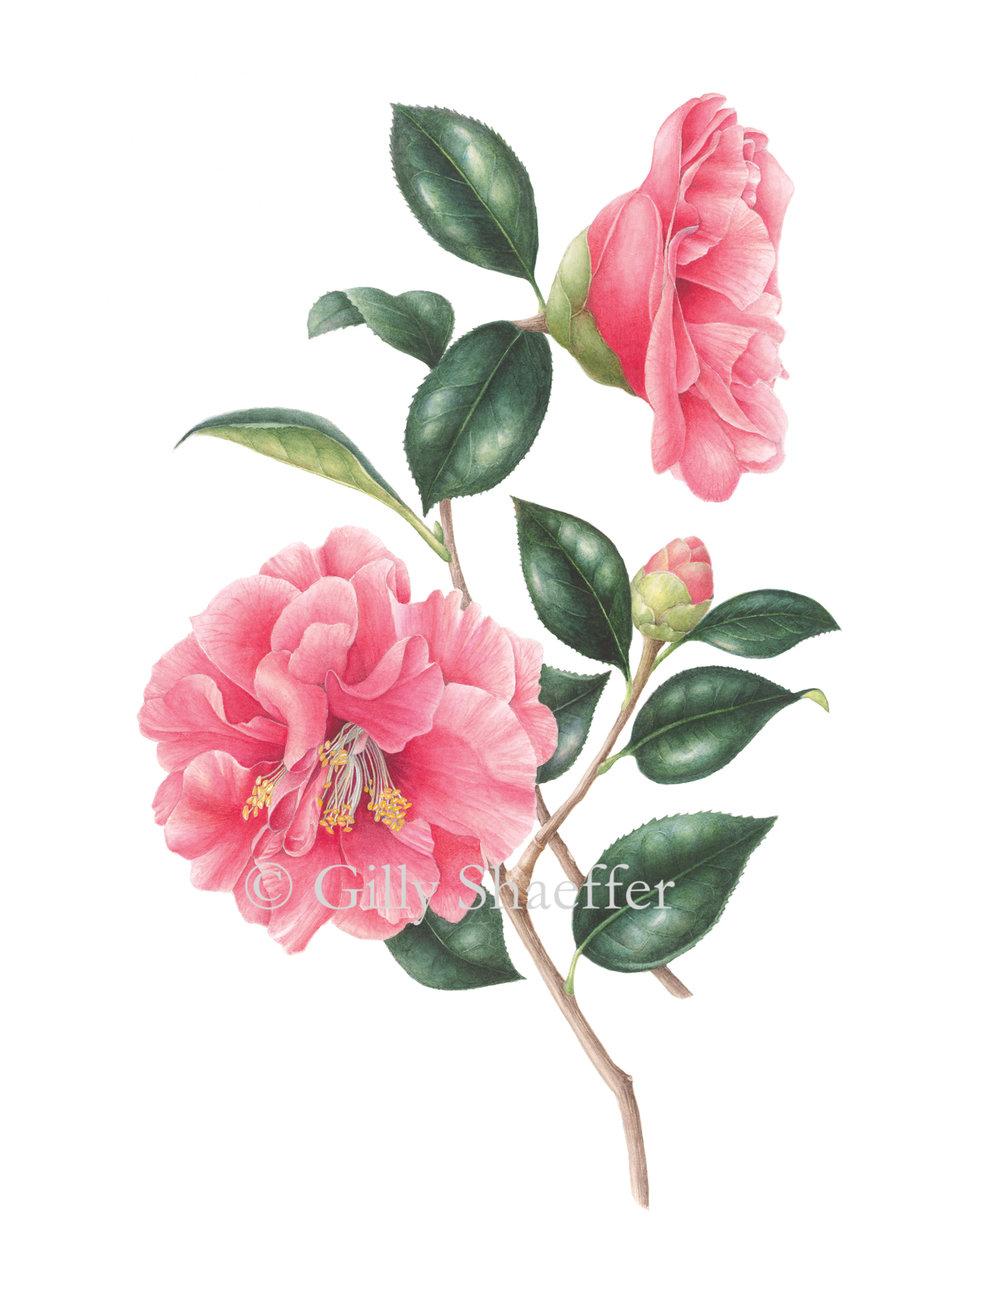 Camellia_1 copy.jpg